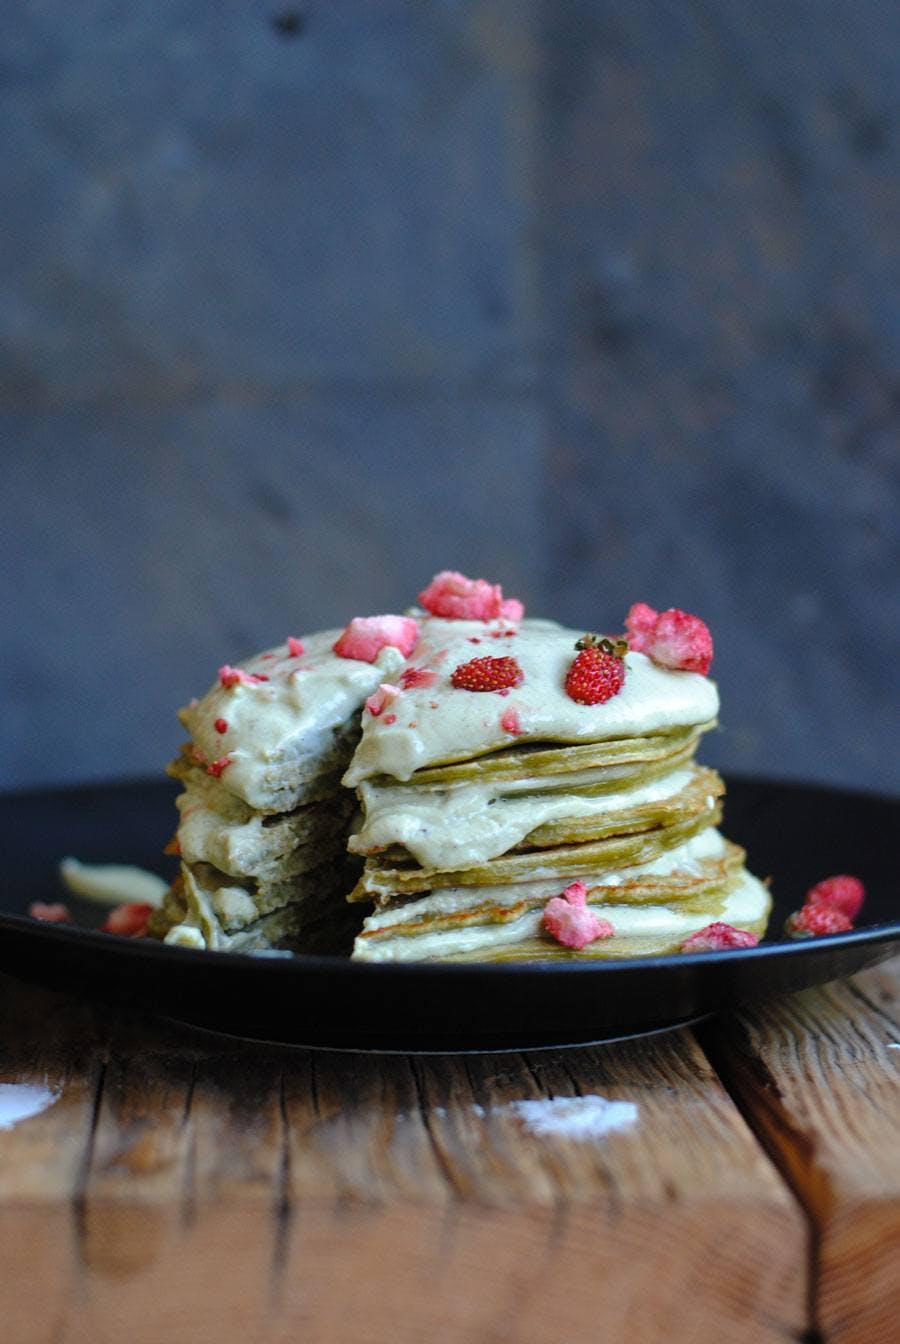 Matcha protein crepe-ish cake with Matcha yoghurt